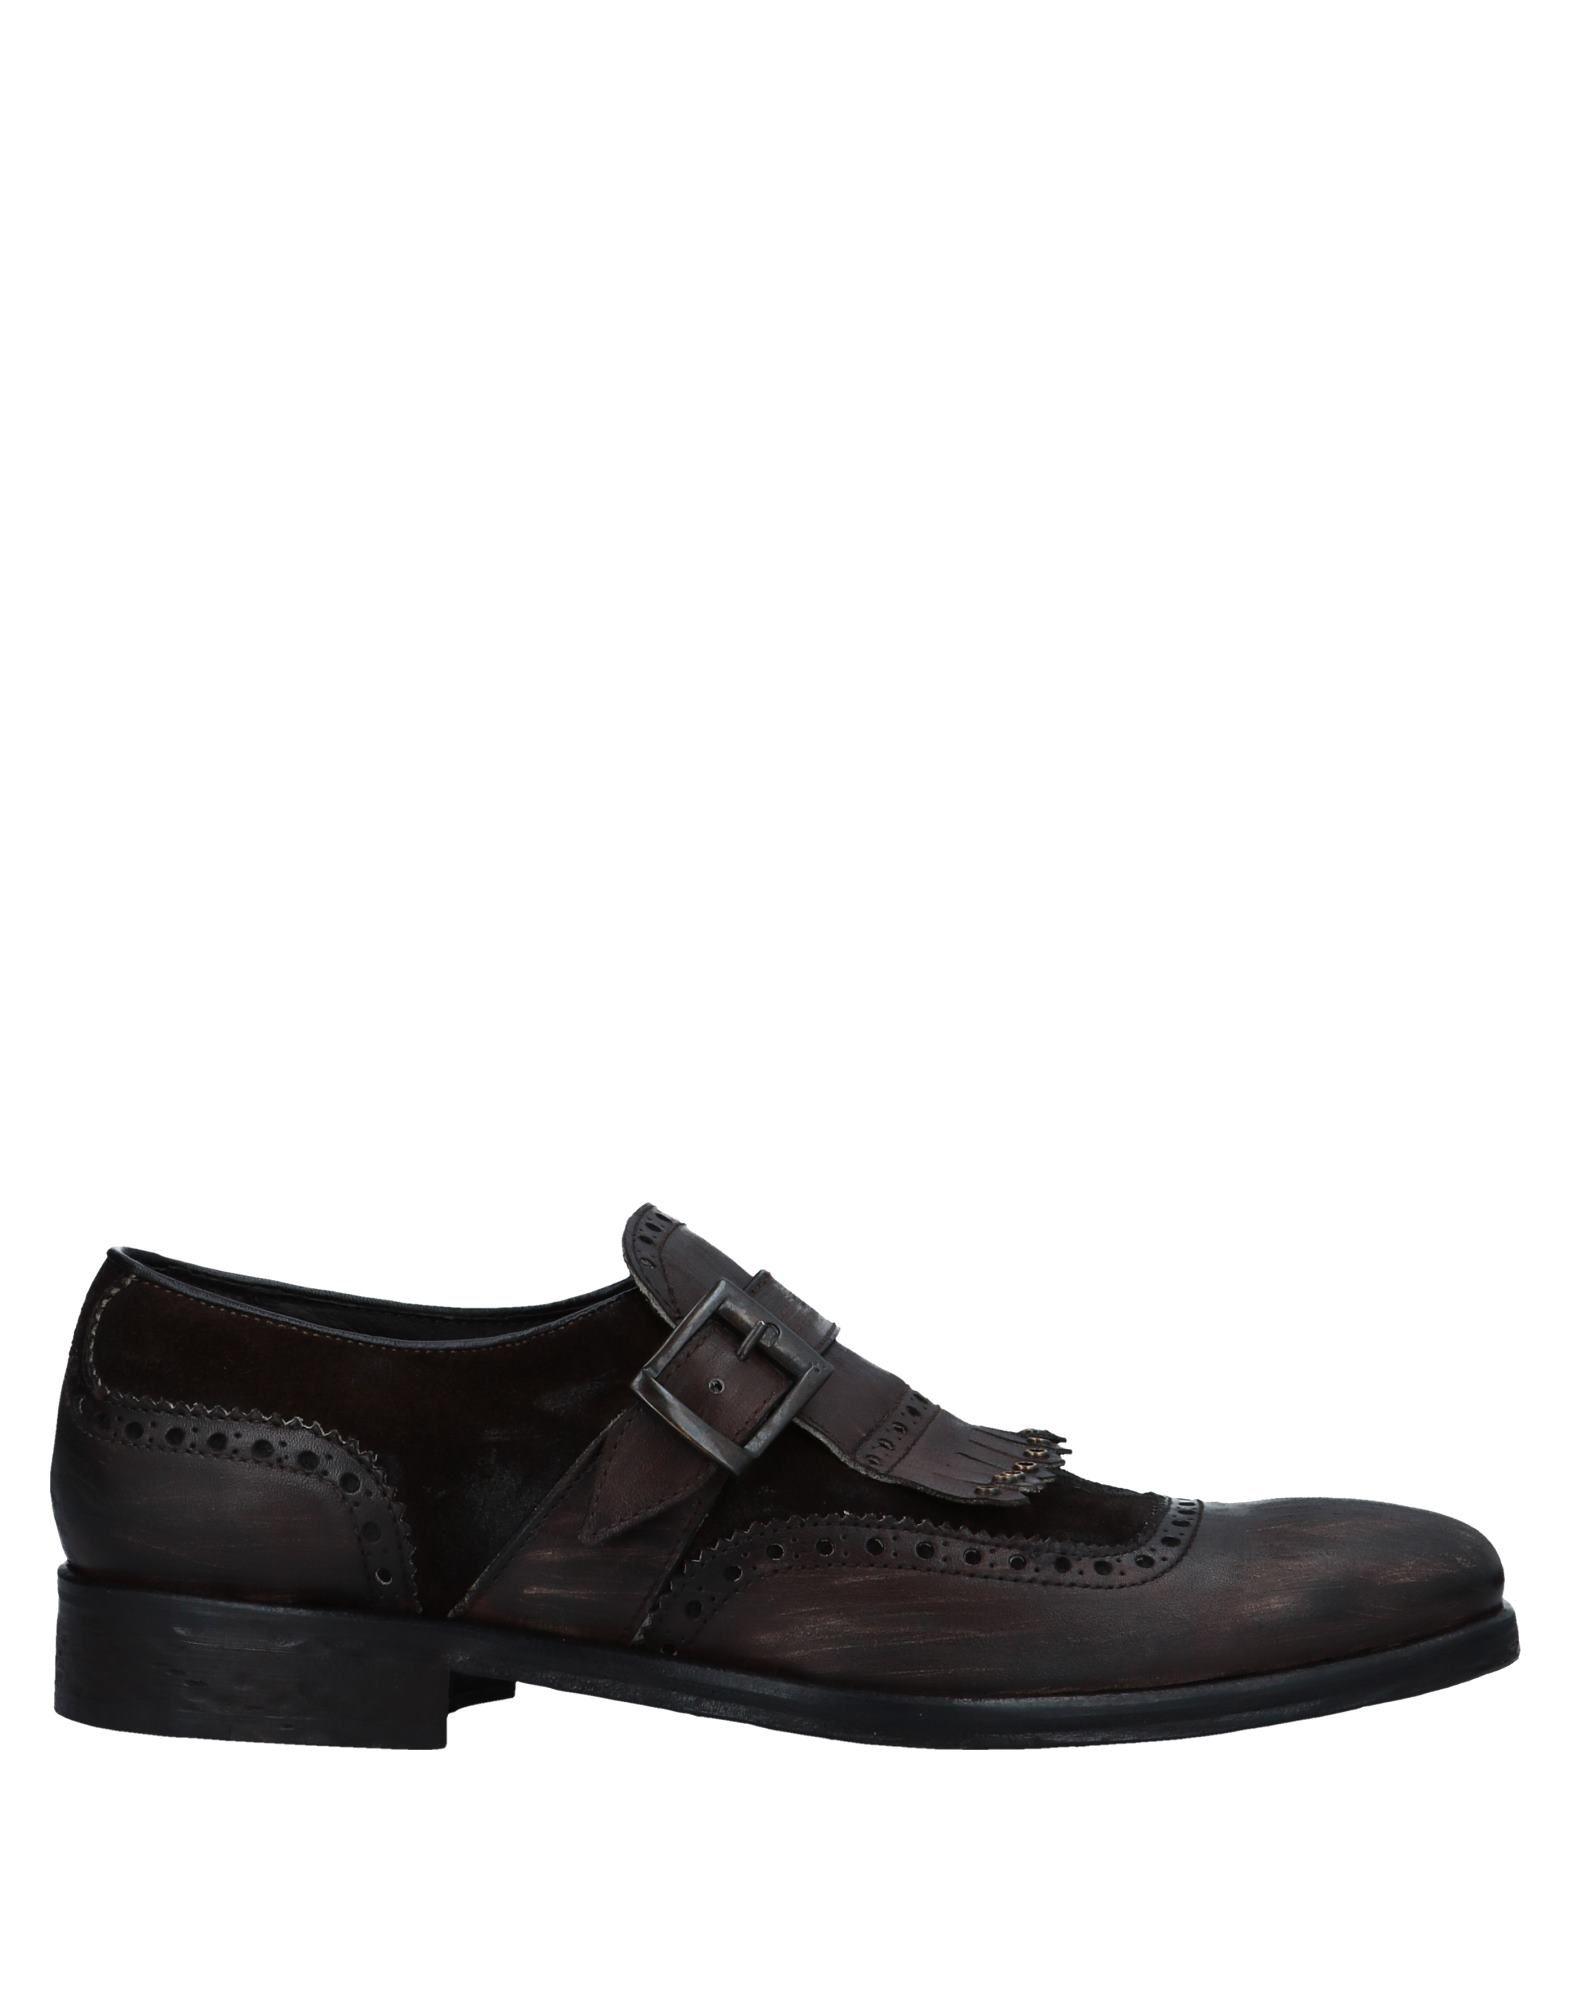 Daniele Alessandrini Gute Mokassins Herren  11284680OA Gute Alessandrini Qualität beliebte Schuhe e2dd87